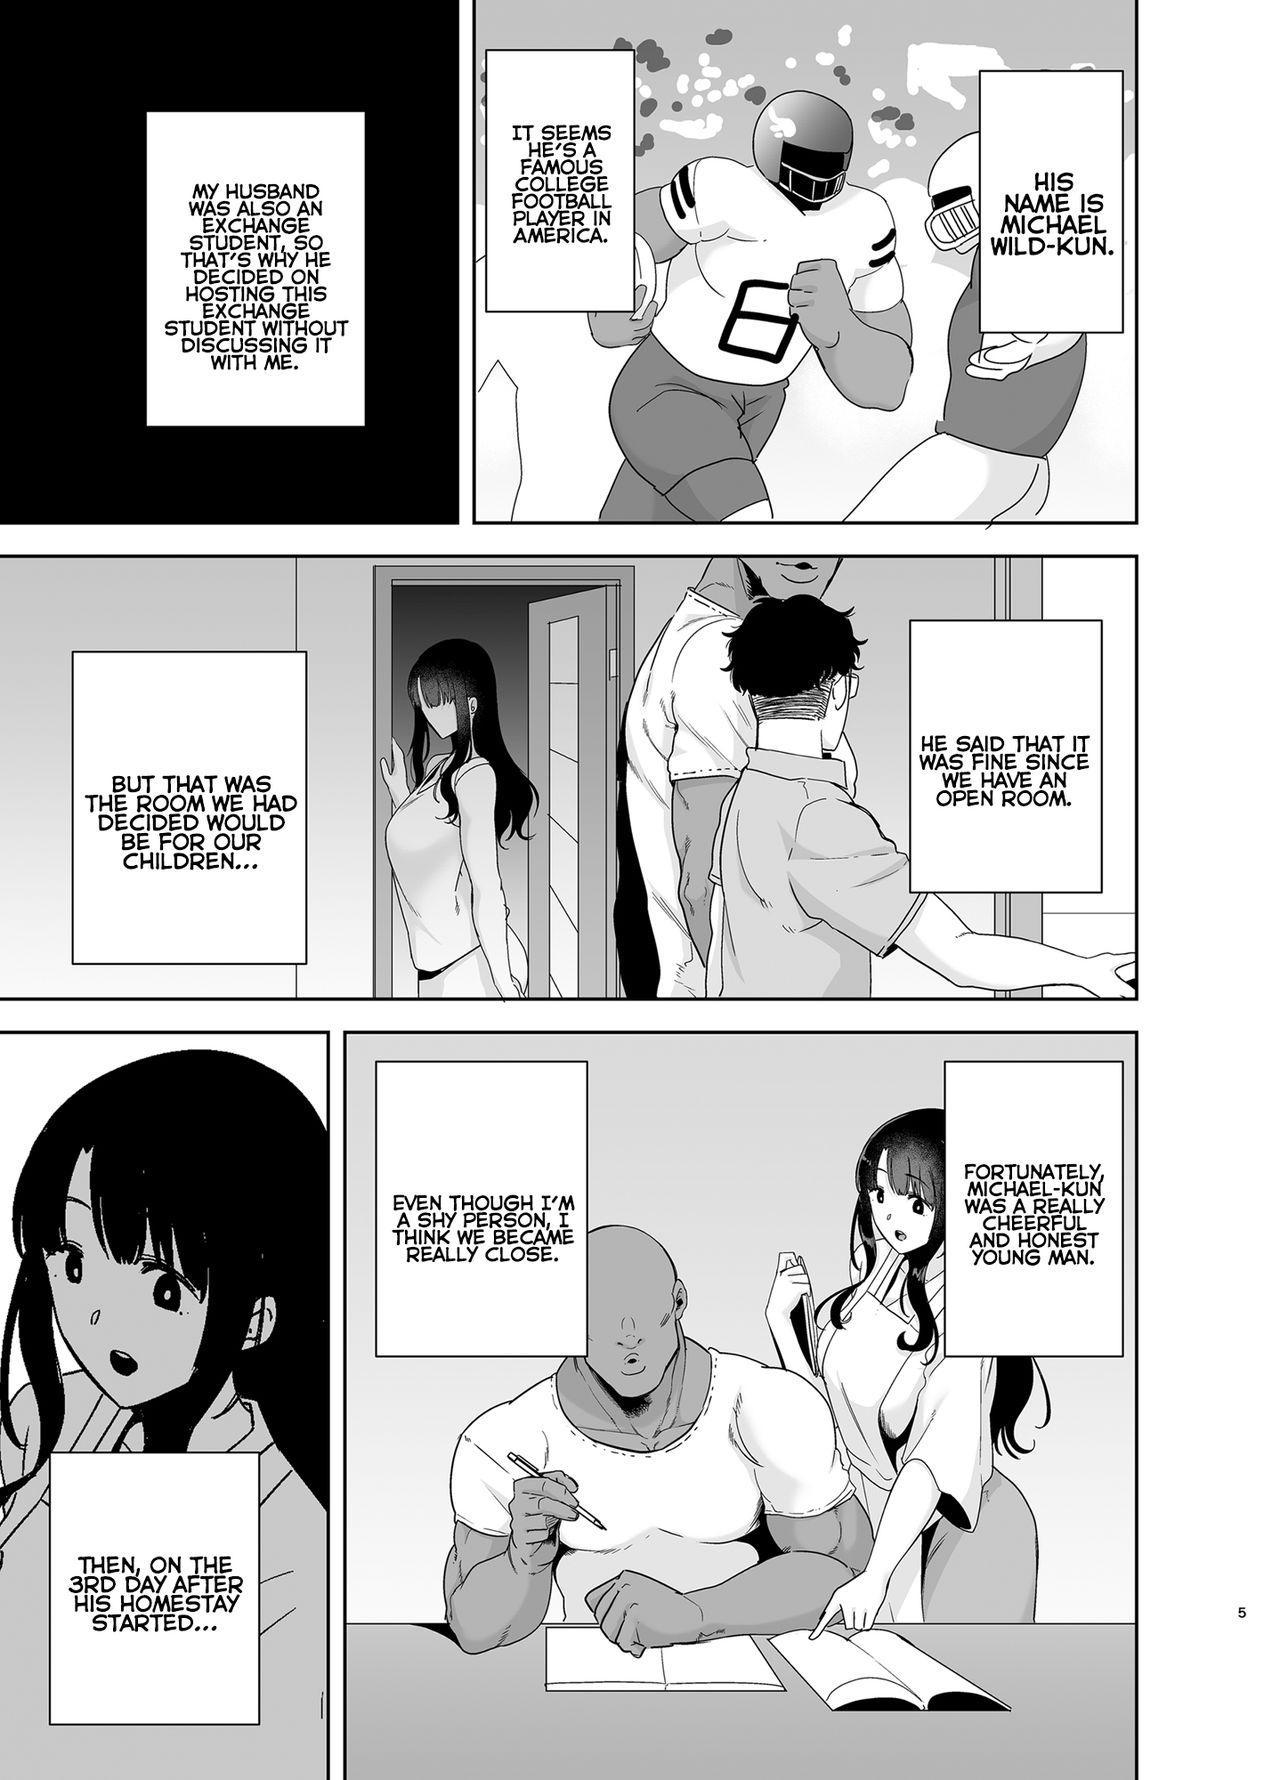 [DOLL PLAY (Kurosu Gatari)] Wild-shiki Nihonjin Tsuma no Netorikata Sono Ichi   Wild Method - How to Steal a Japanese Housewife - Part One [English] [Coffedrug] [Digital] 44